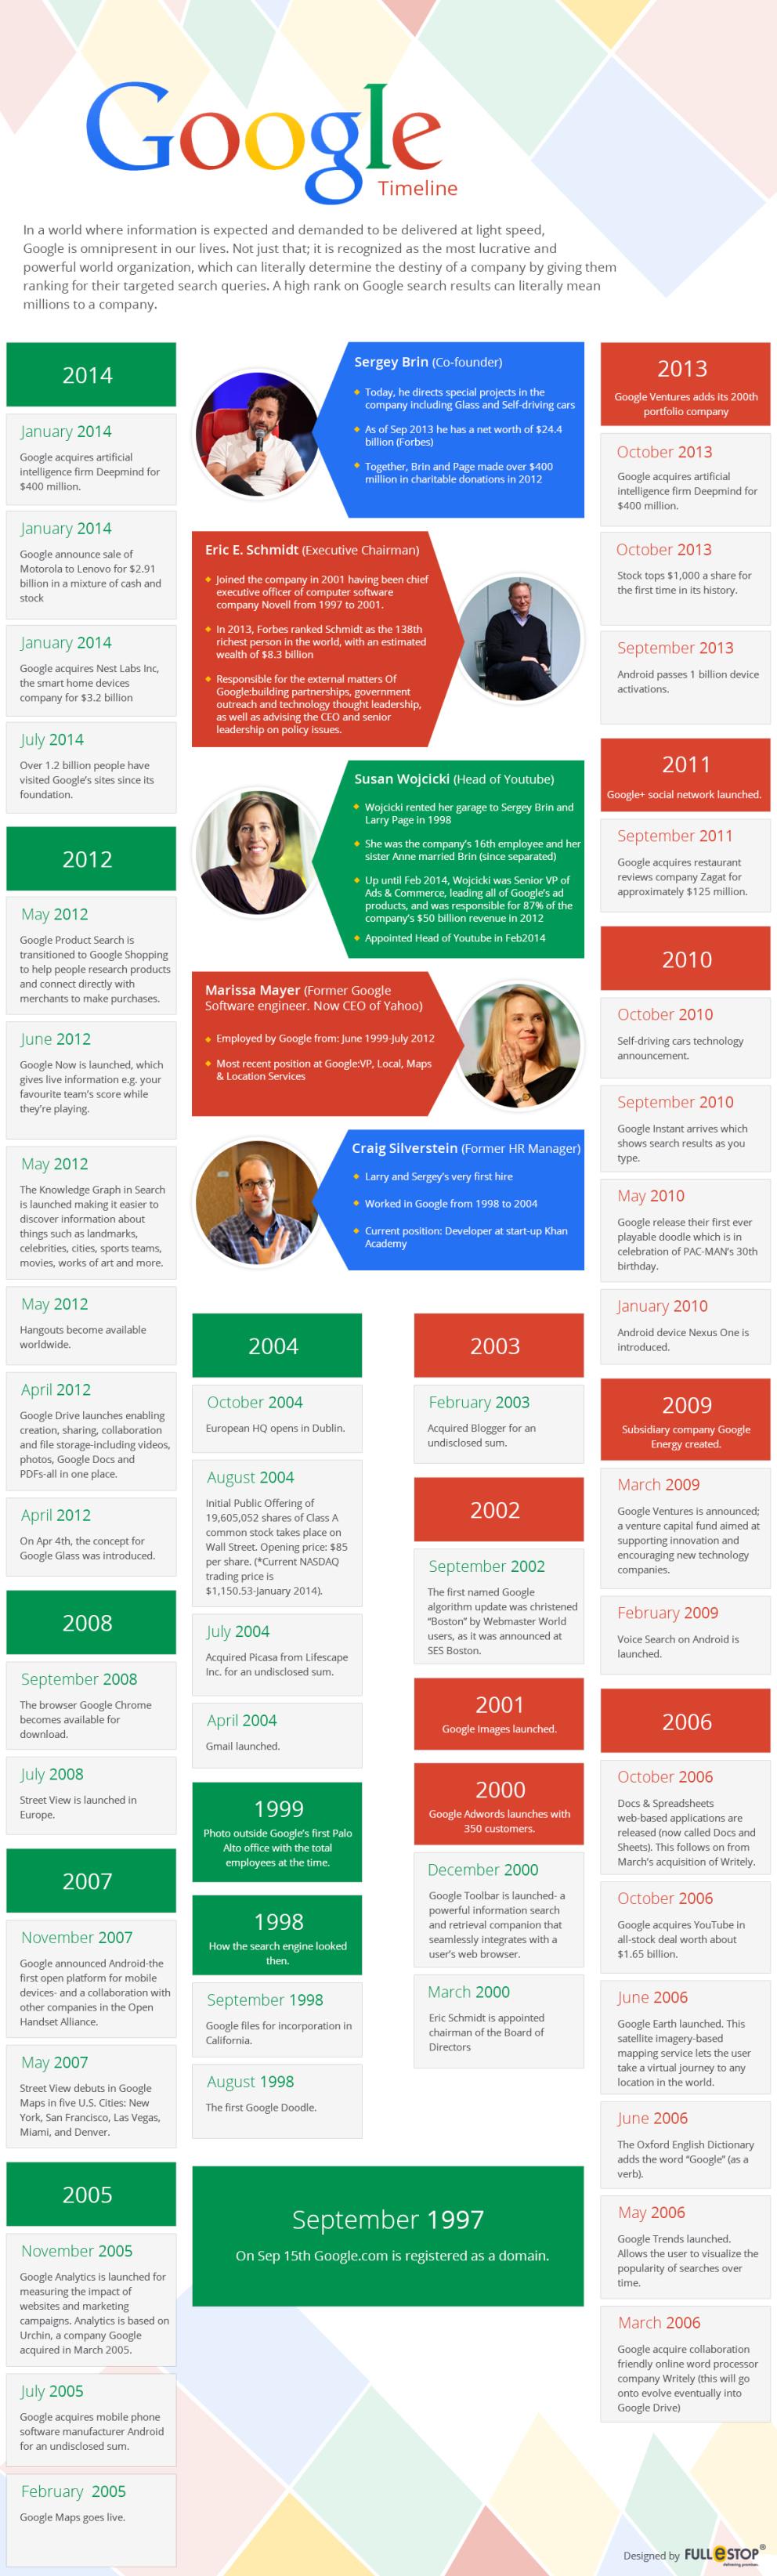 Google Timeline #infographic